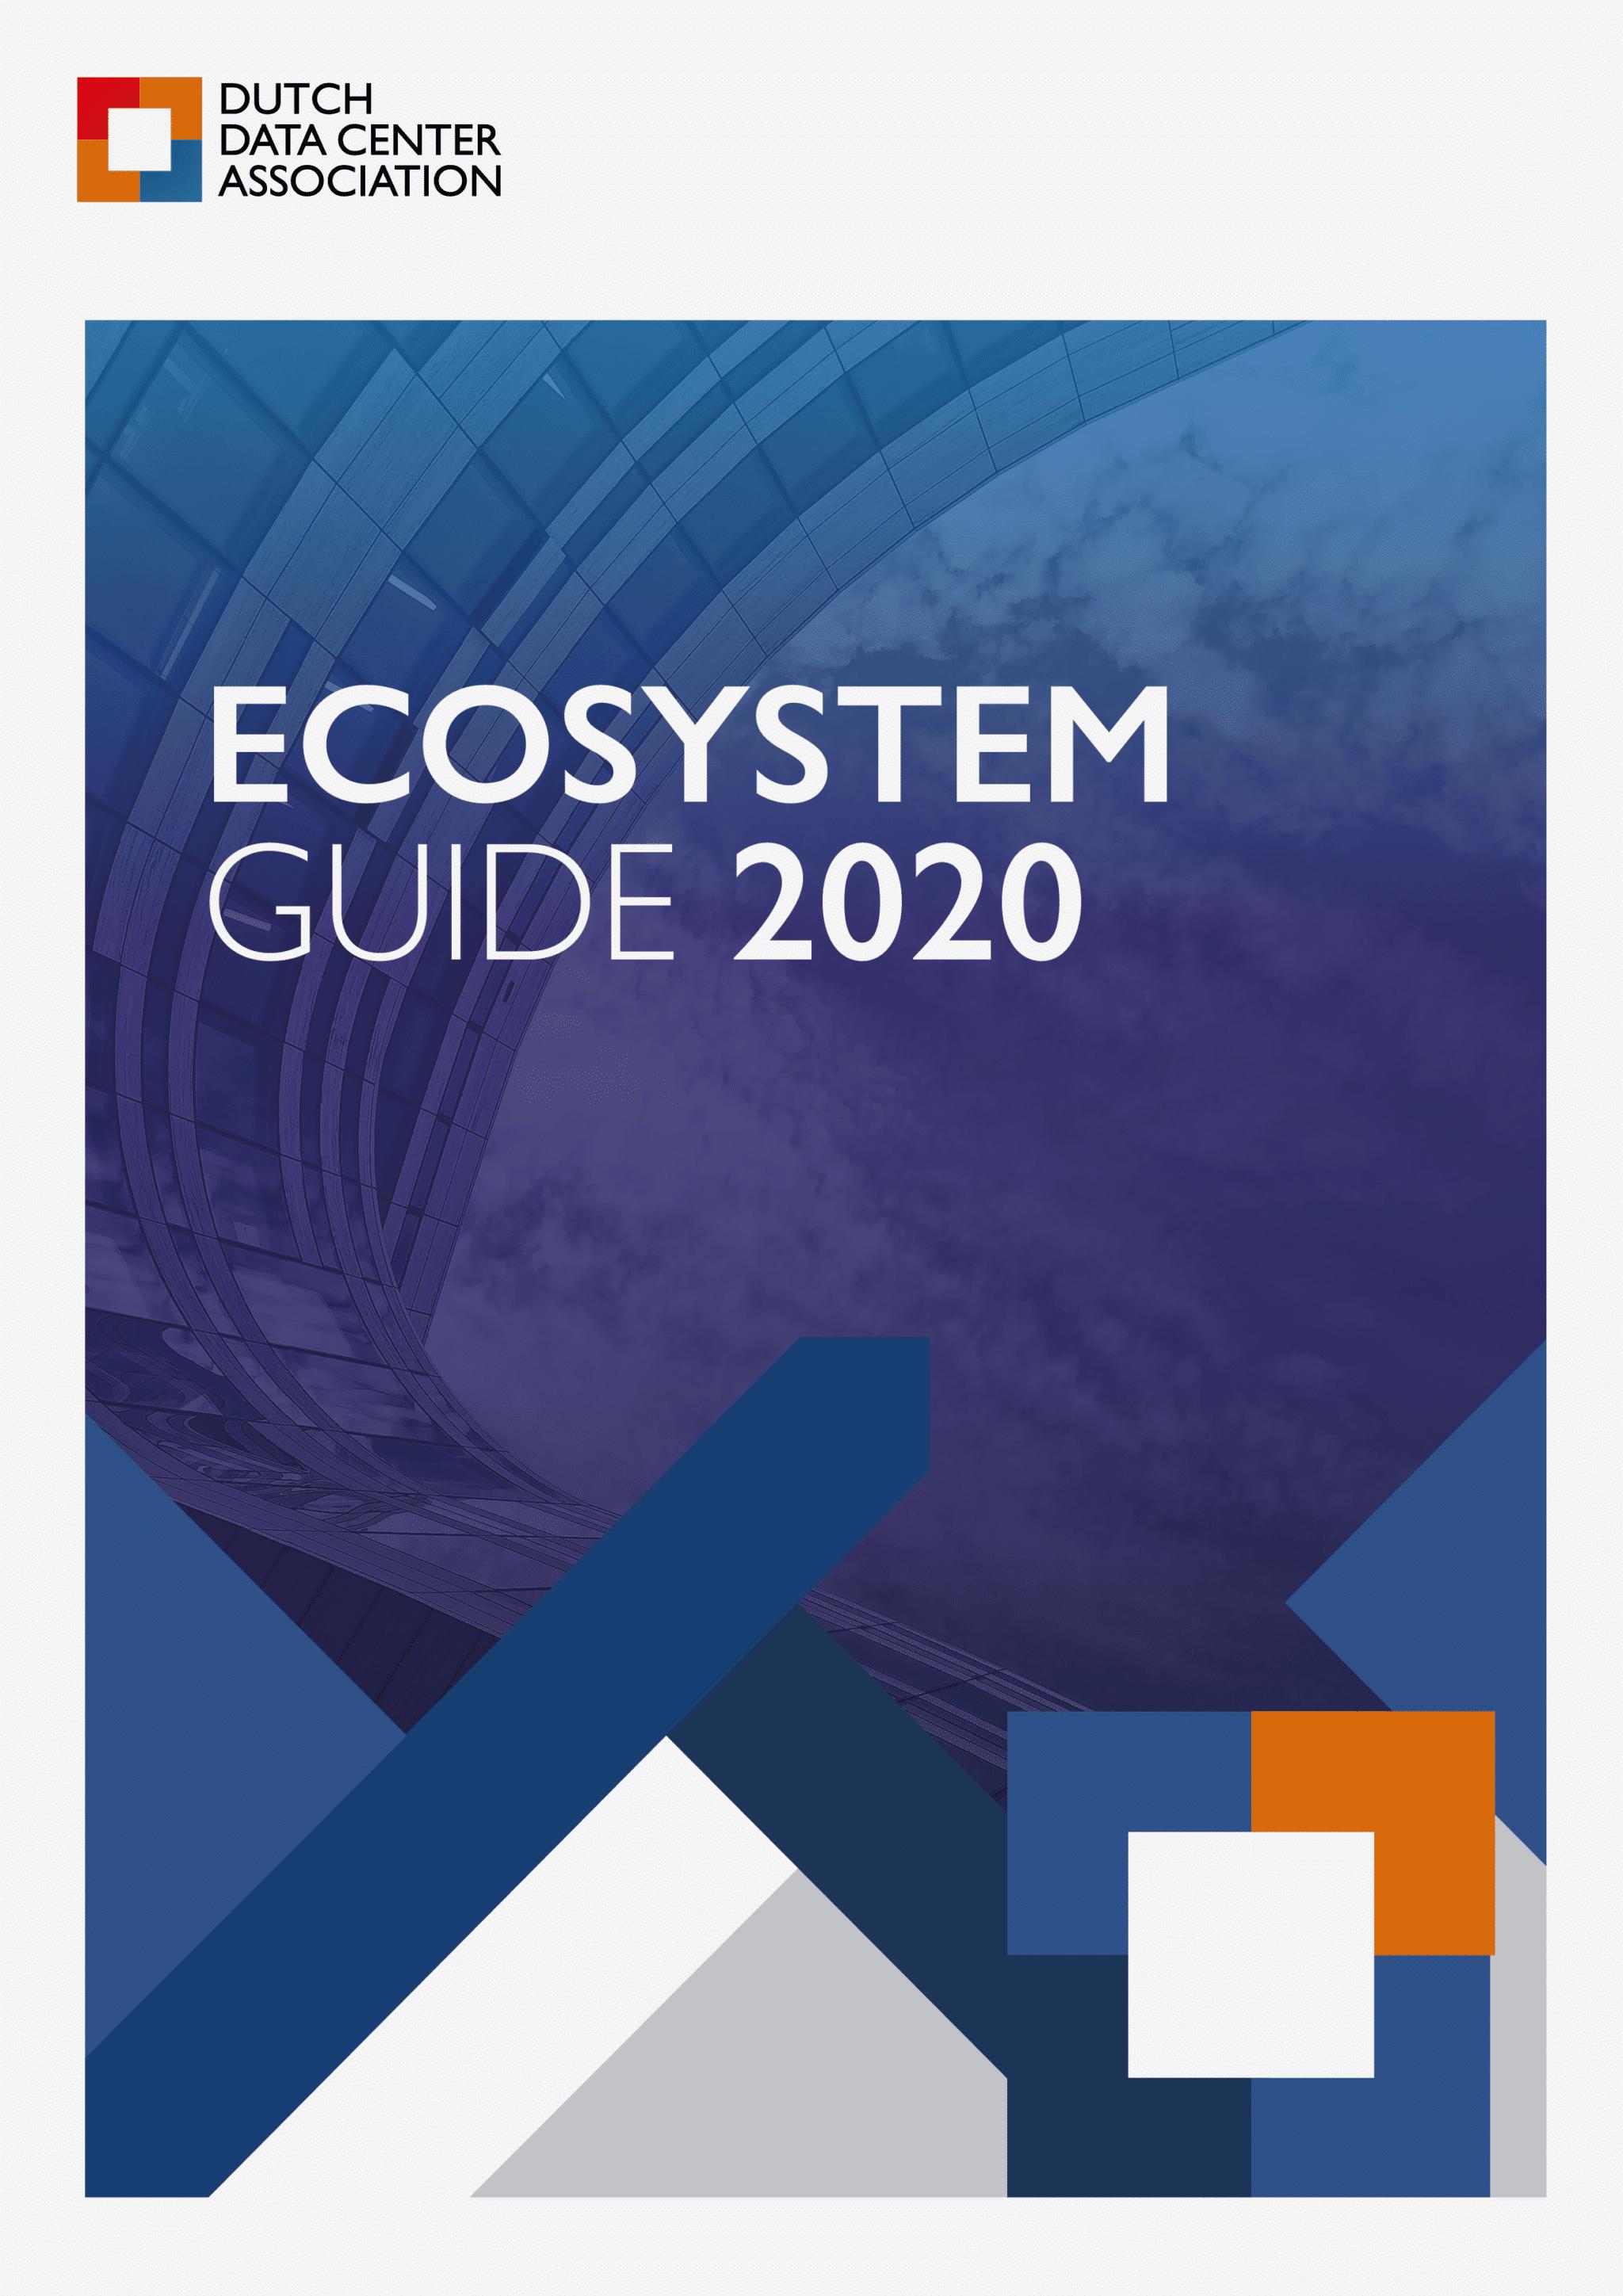 DDA Publishes Ecosystem Guide 2020